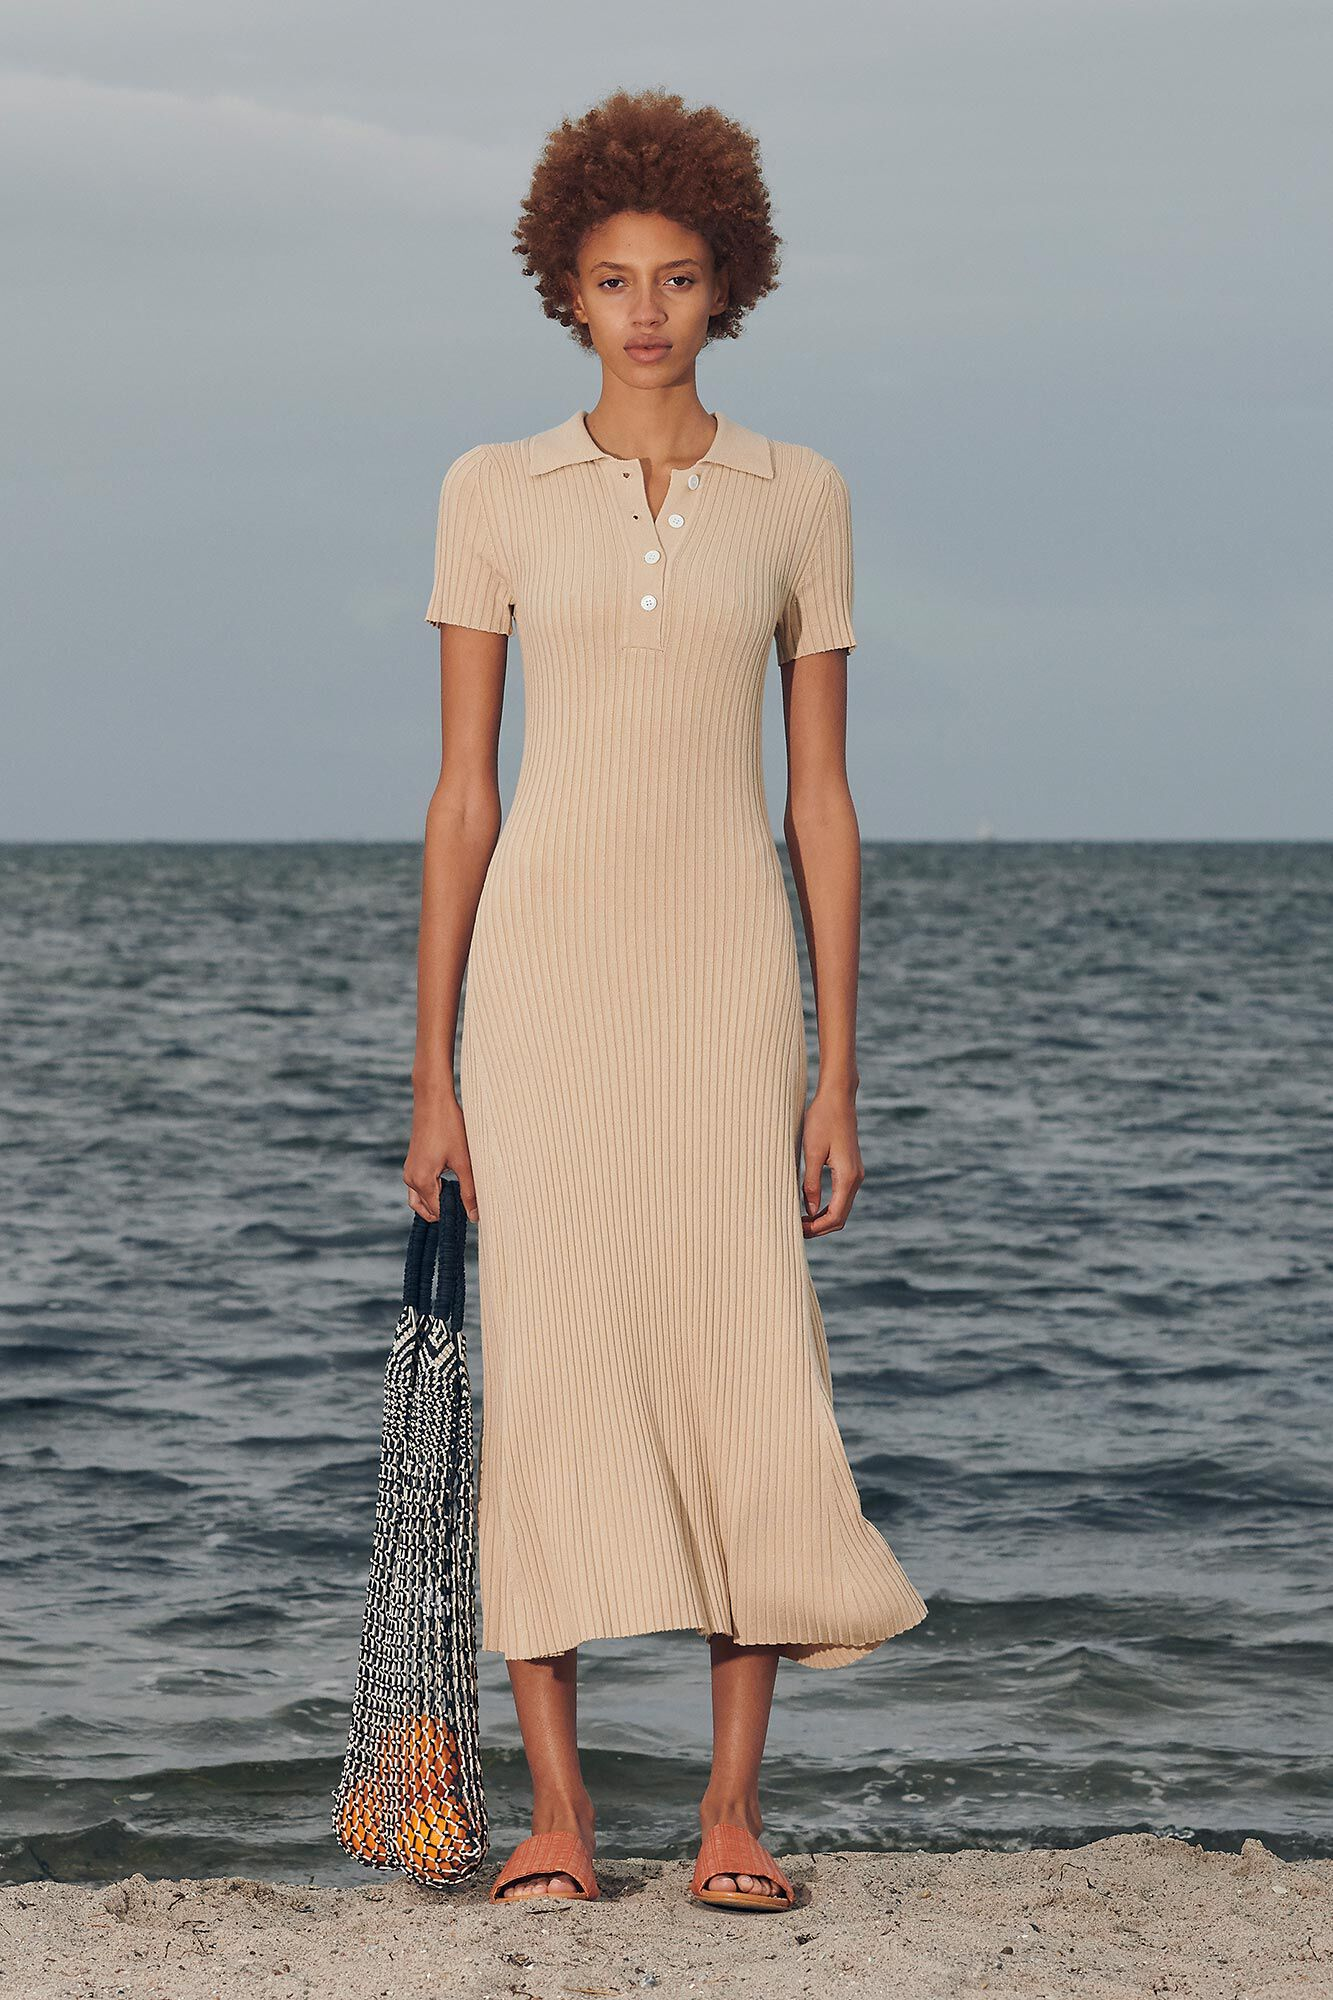 Lucy polo dress 13997